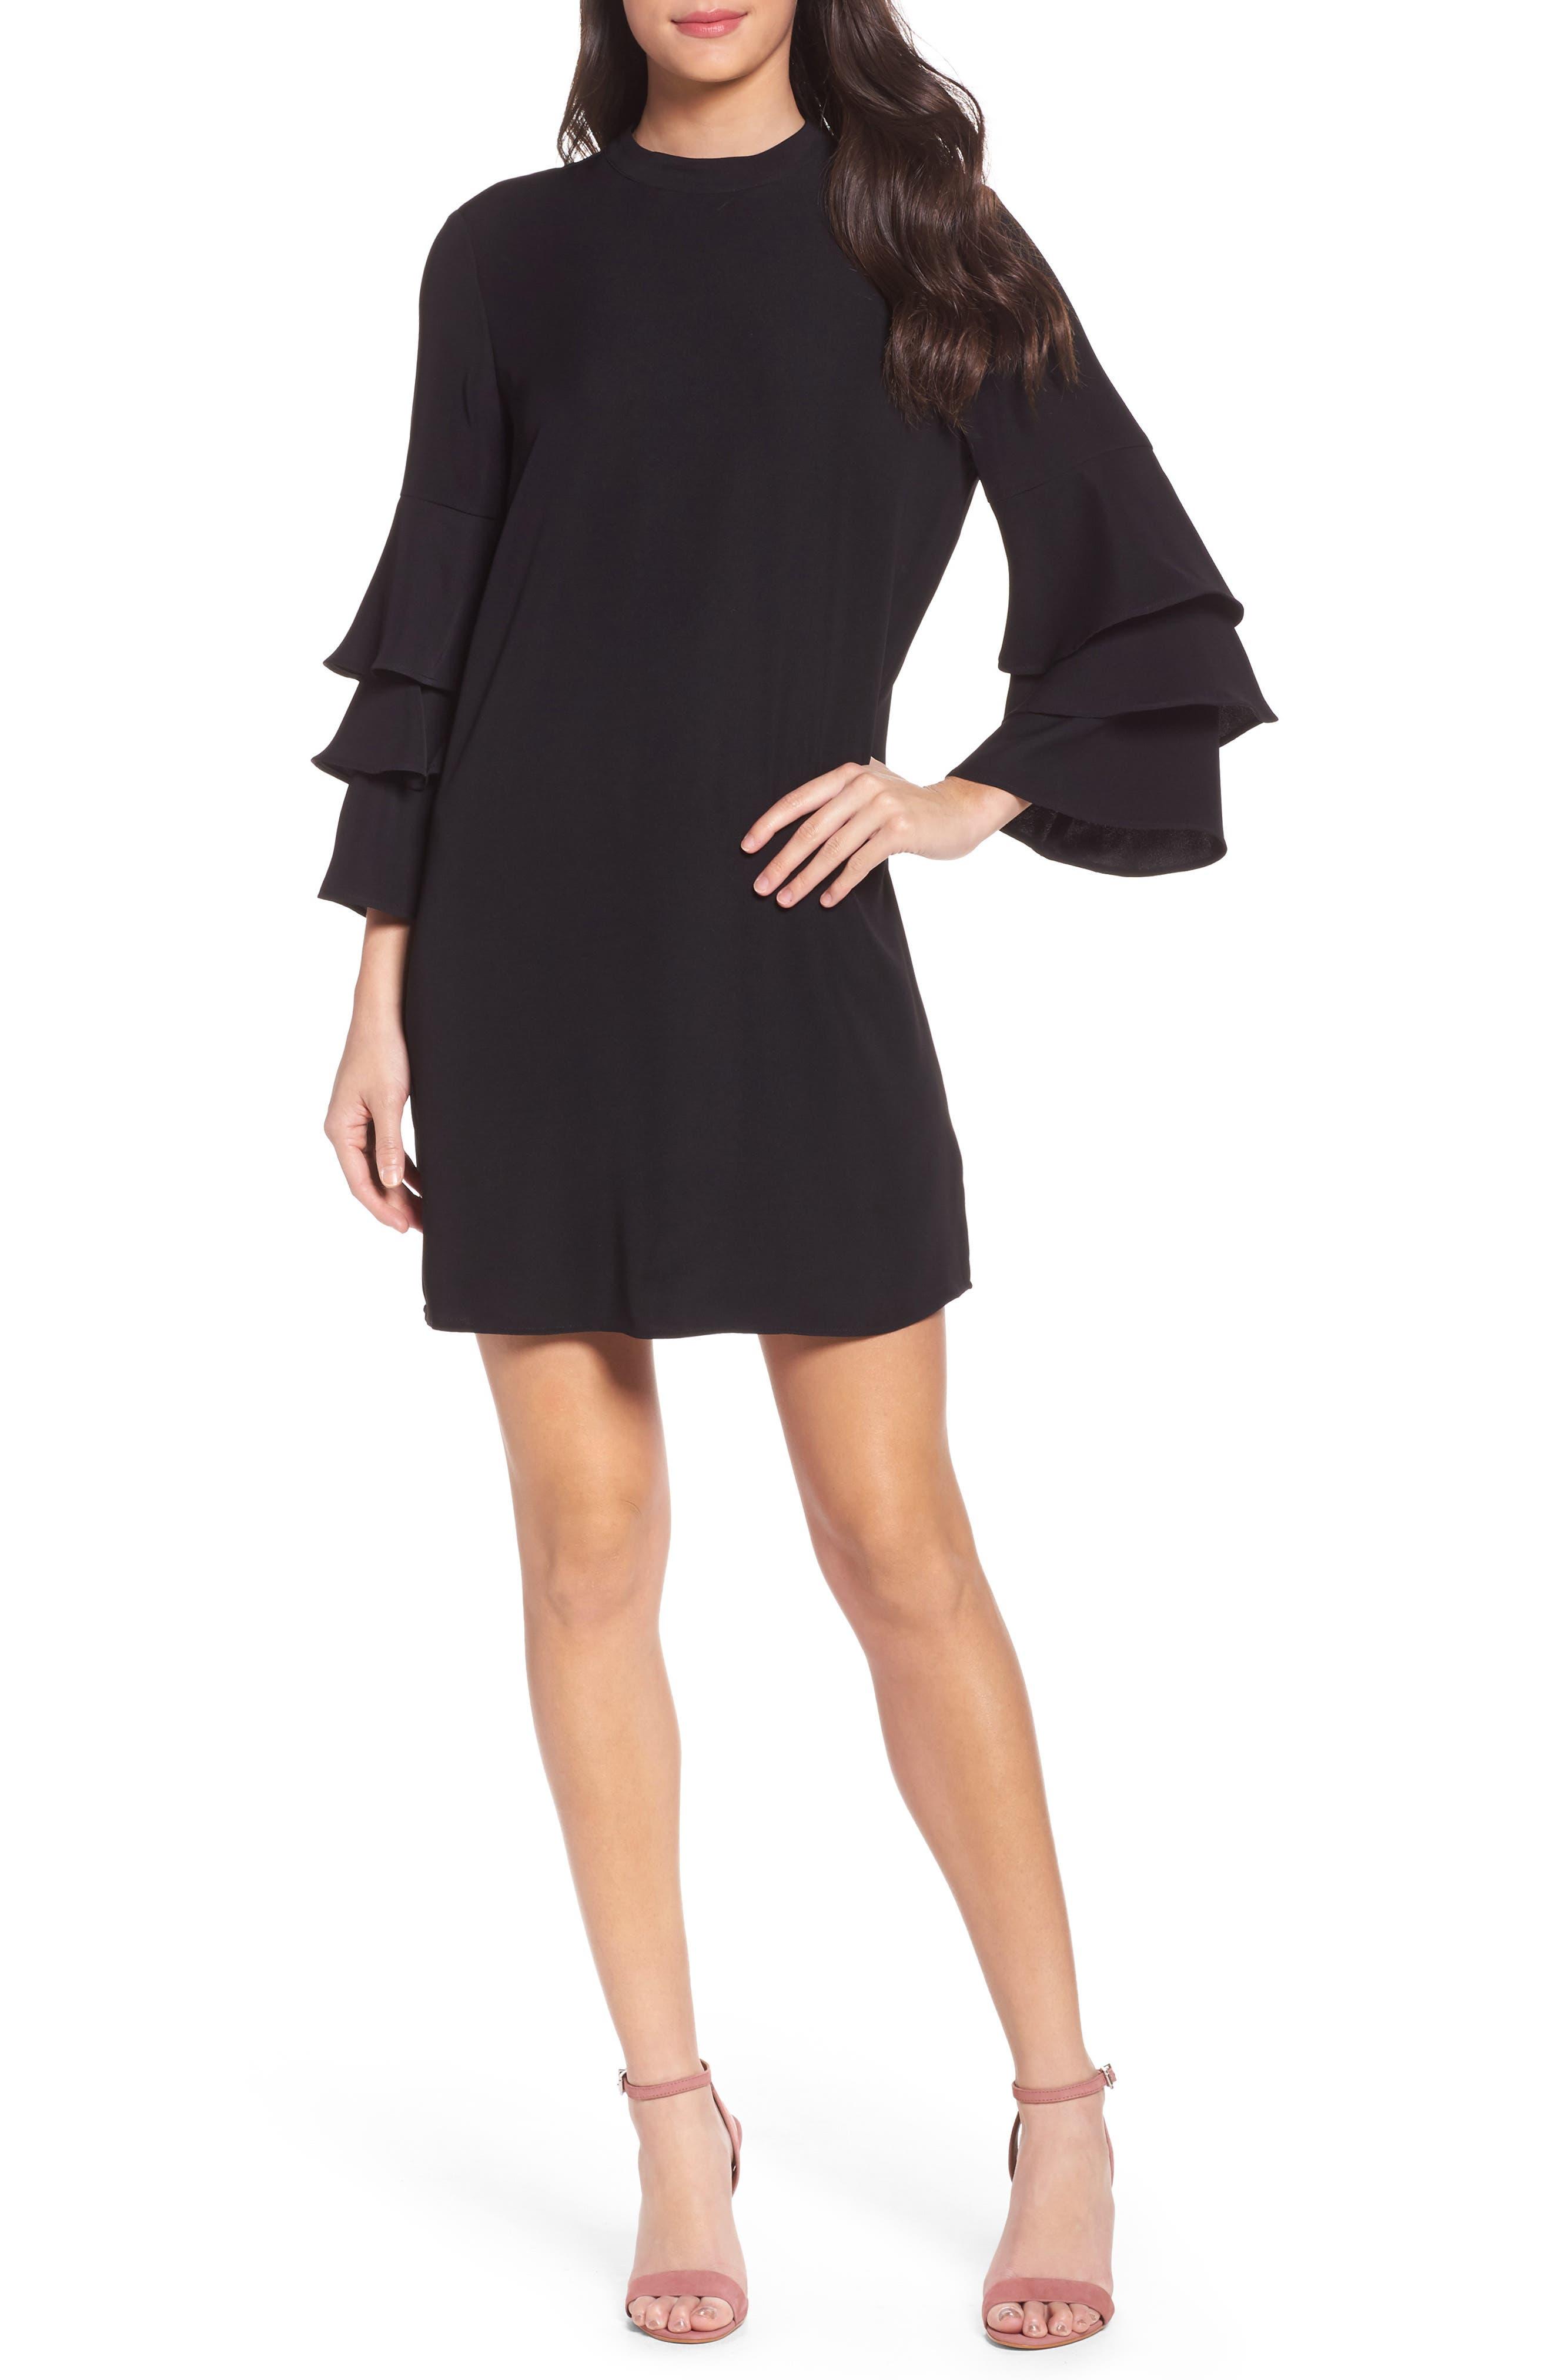 Alternate Image 1 Selected - Chelsea28 Ruffle Sleeve Shift Dress